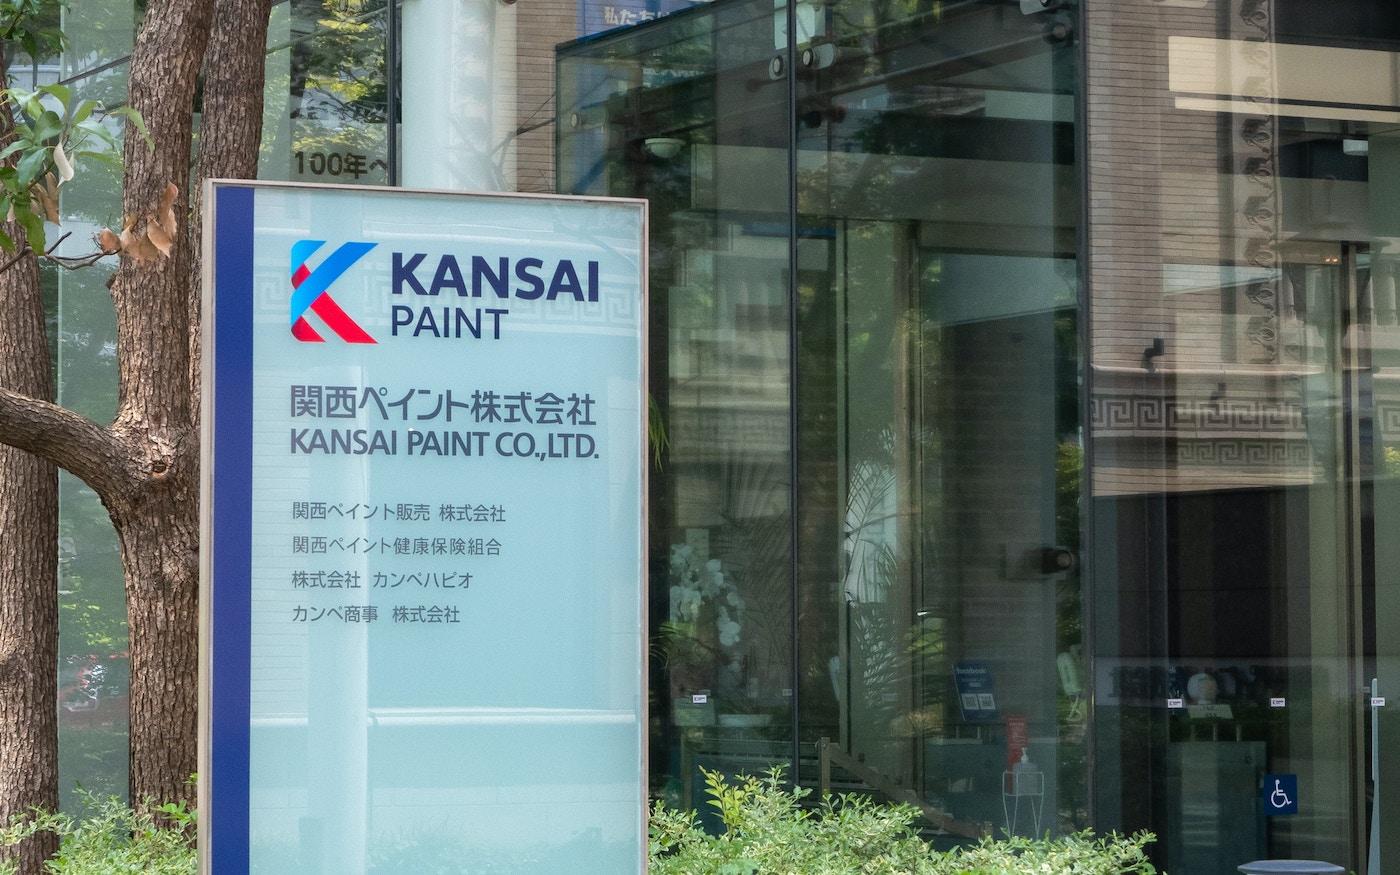 Kansai Paint branded signage